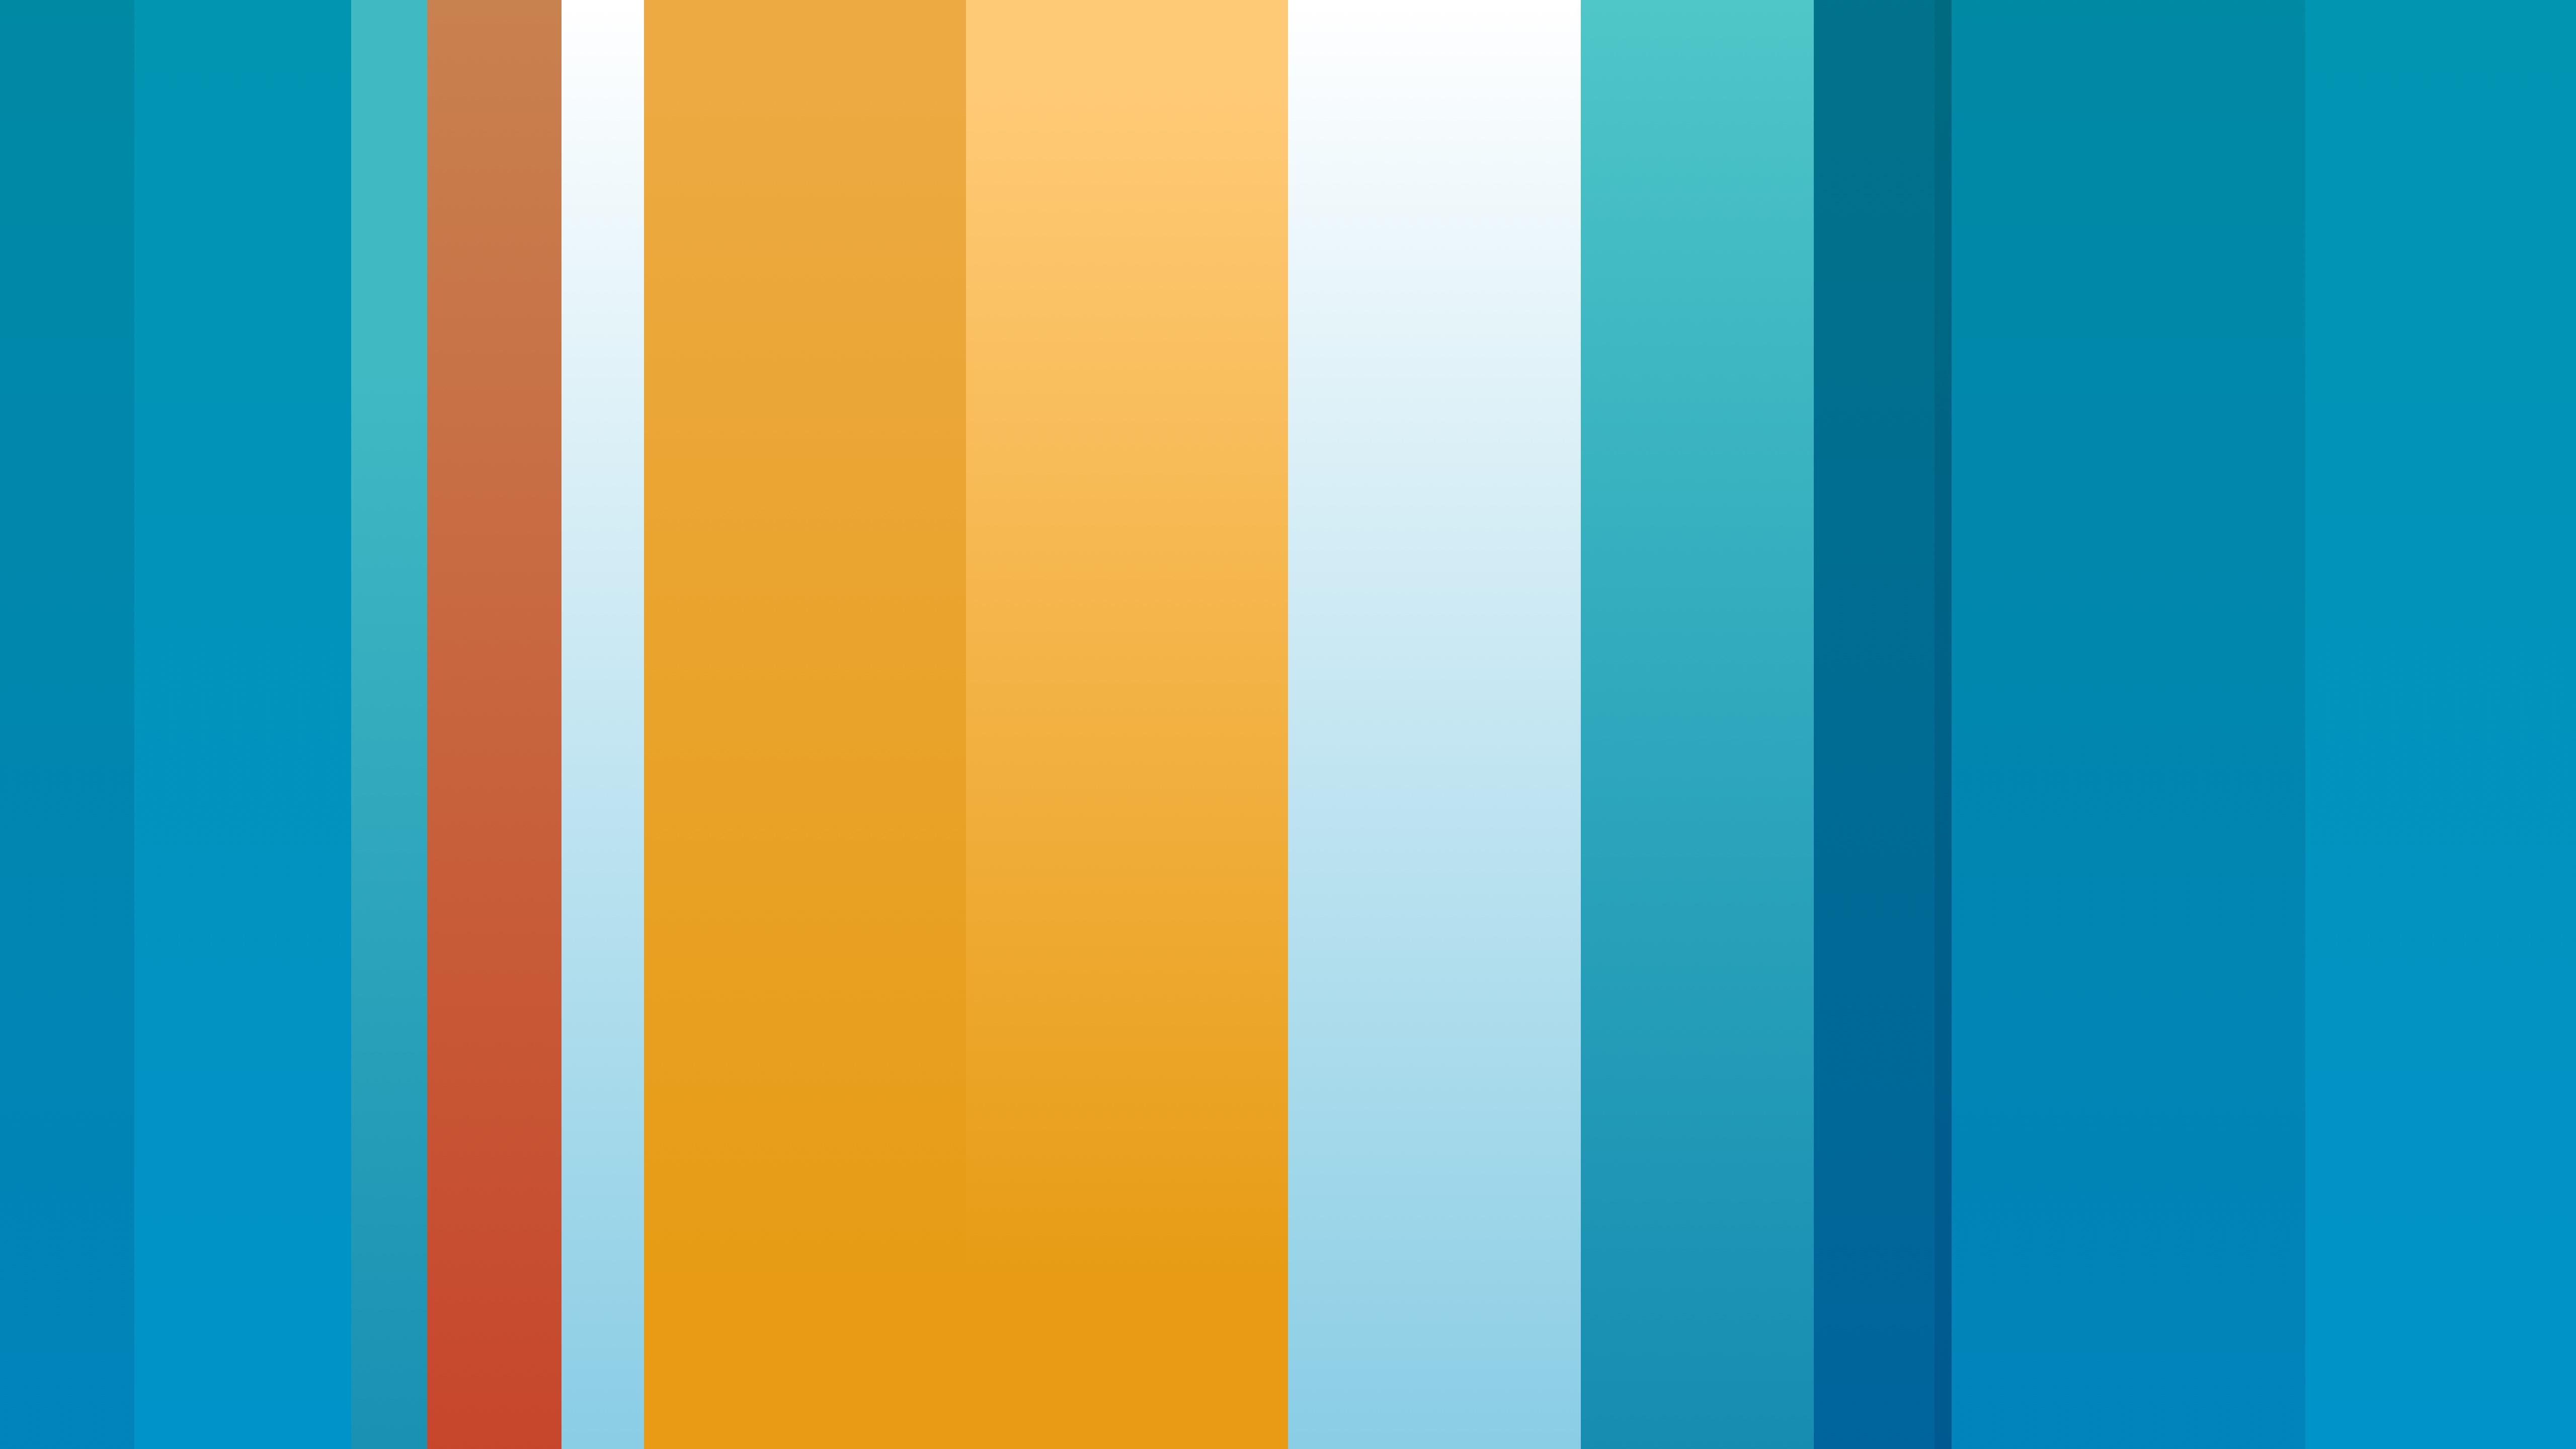 abstract color surfs 4k 1616870955 - Abstract Color Surfs 4k - Abstract Color Surfs 4k wallpapers